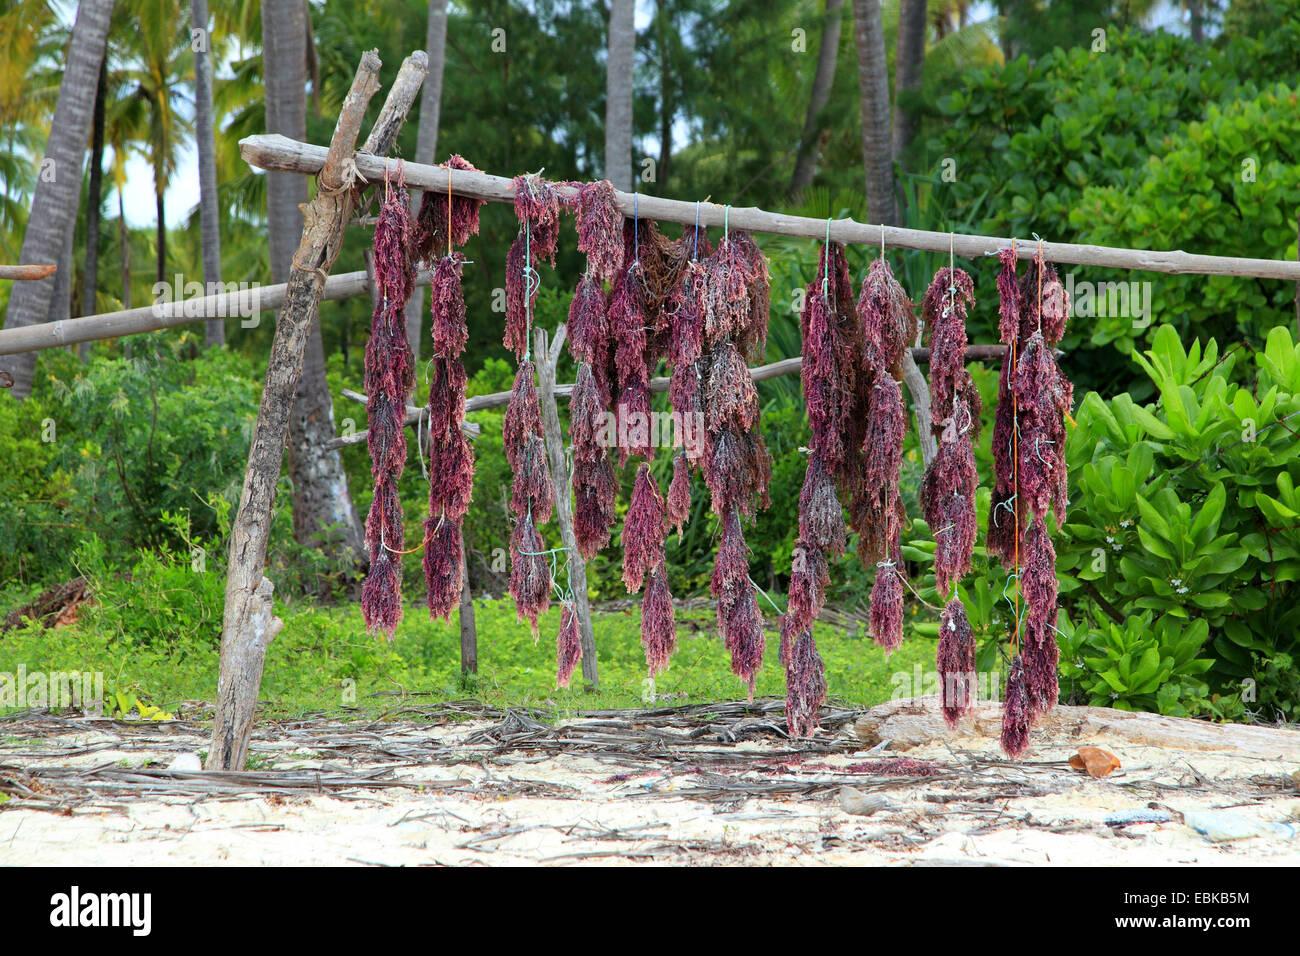 red seaweeds hanging up for drying on the beach of Zansibar, Tanzania, Sansibar - Stock Image